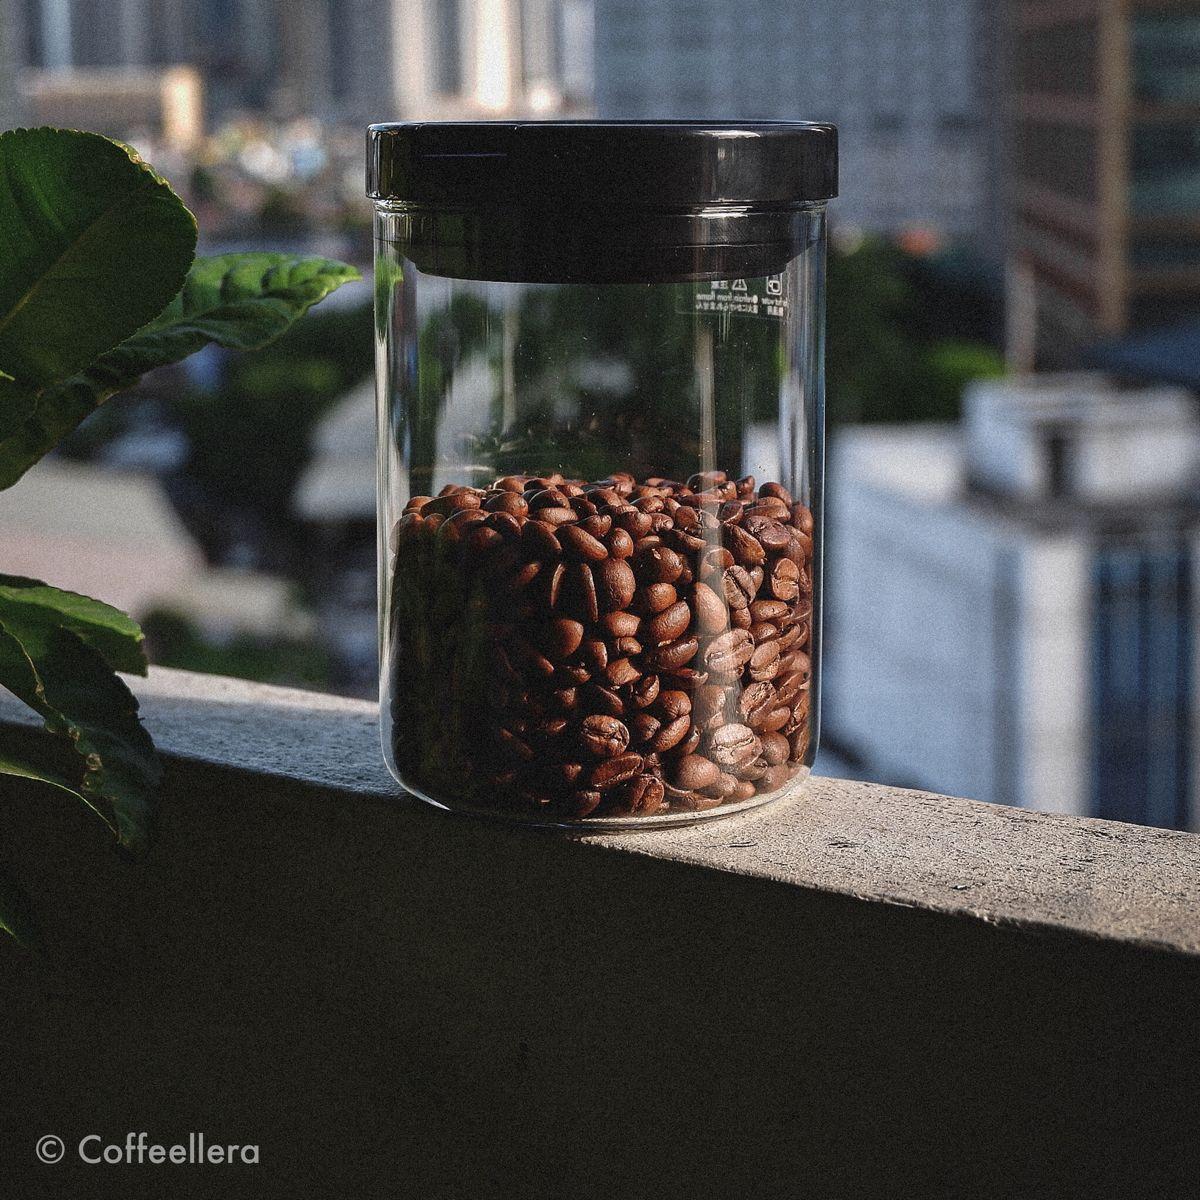 Coffee Canister in 2020 Coffee, Coffee roasting, Coffee